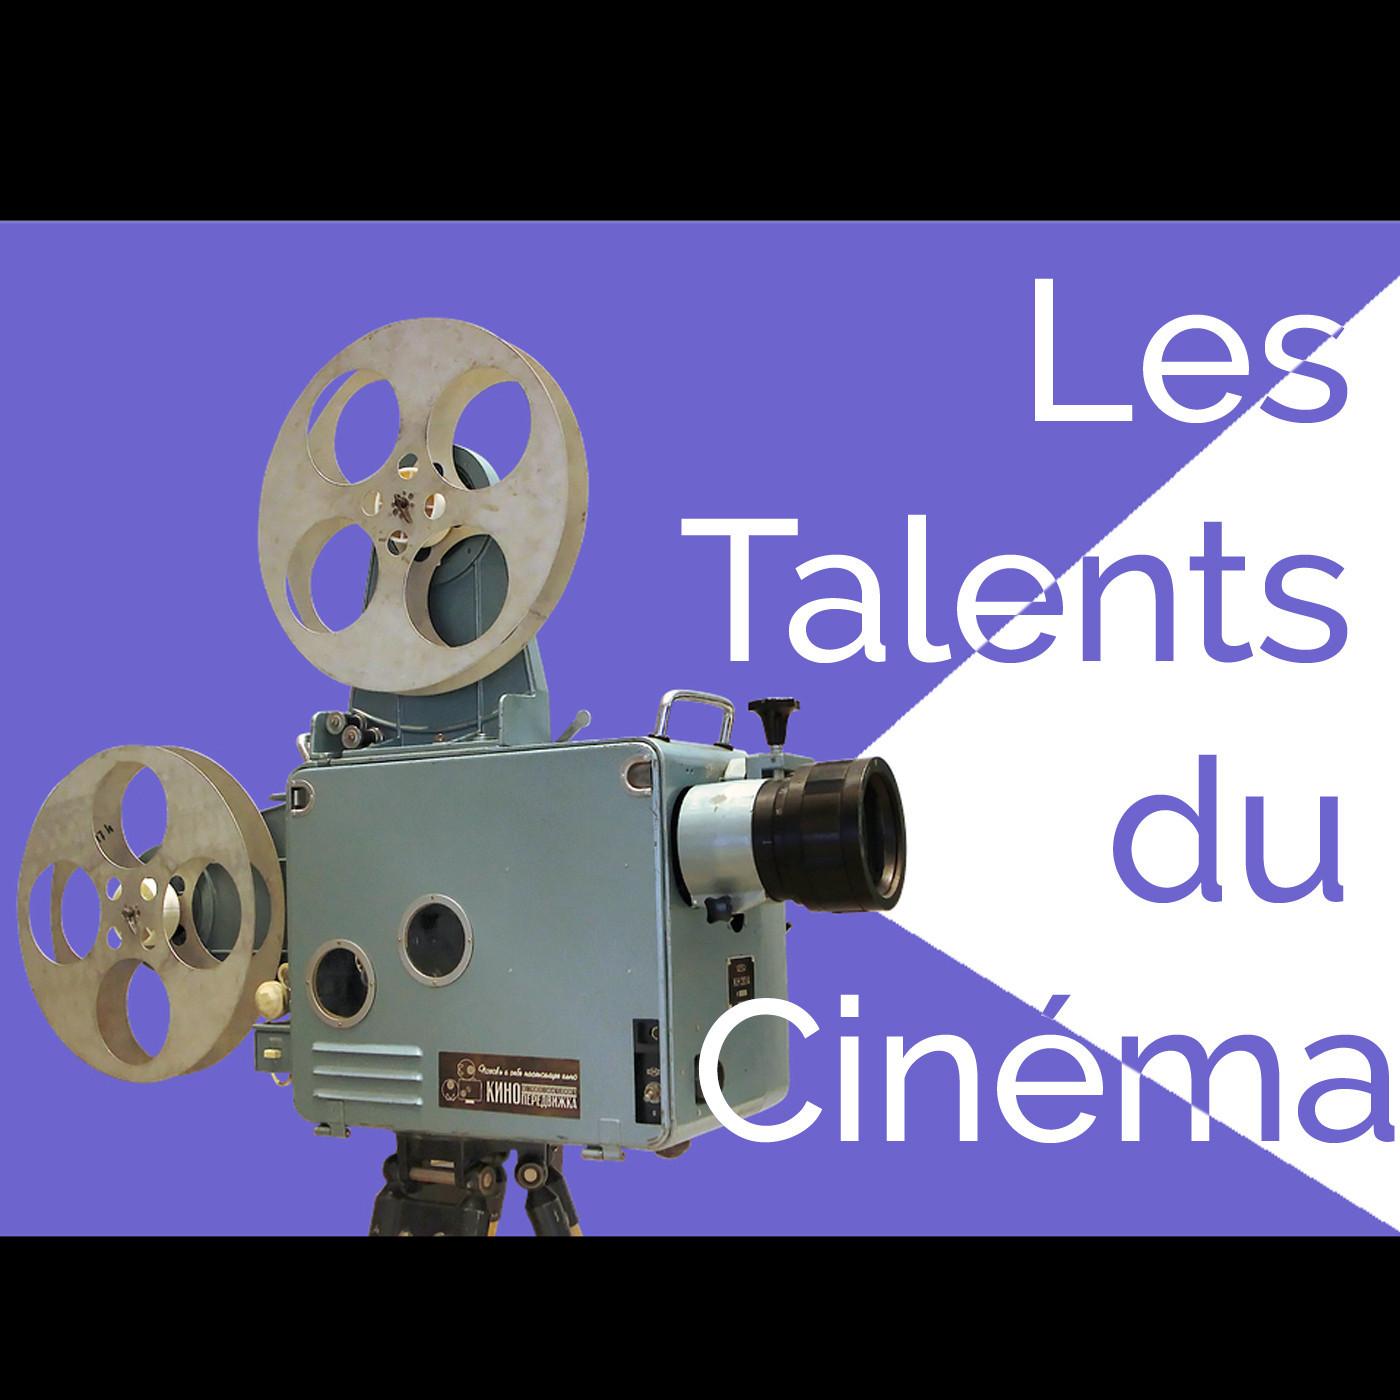 Les Talents du Cinéma - 19 septembre 2020 - Les maladies psychiatriques